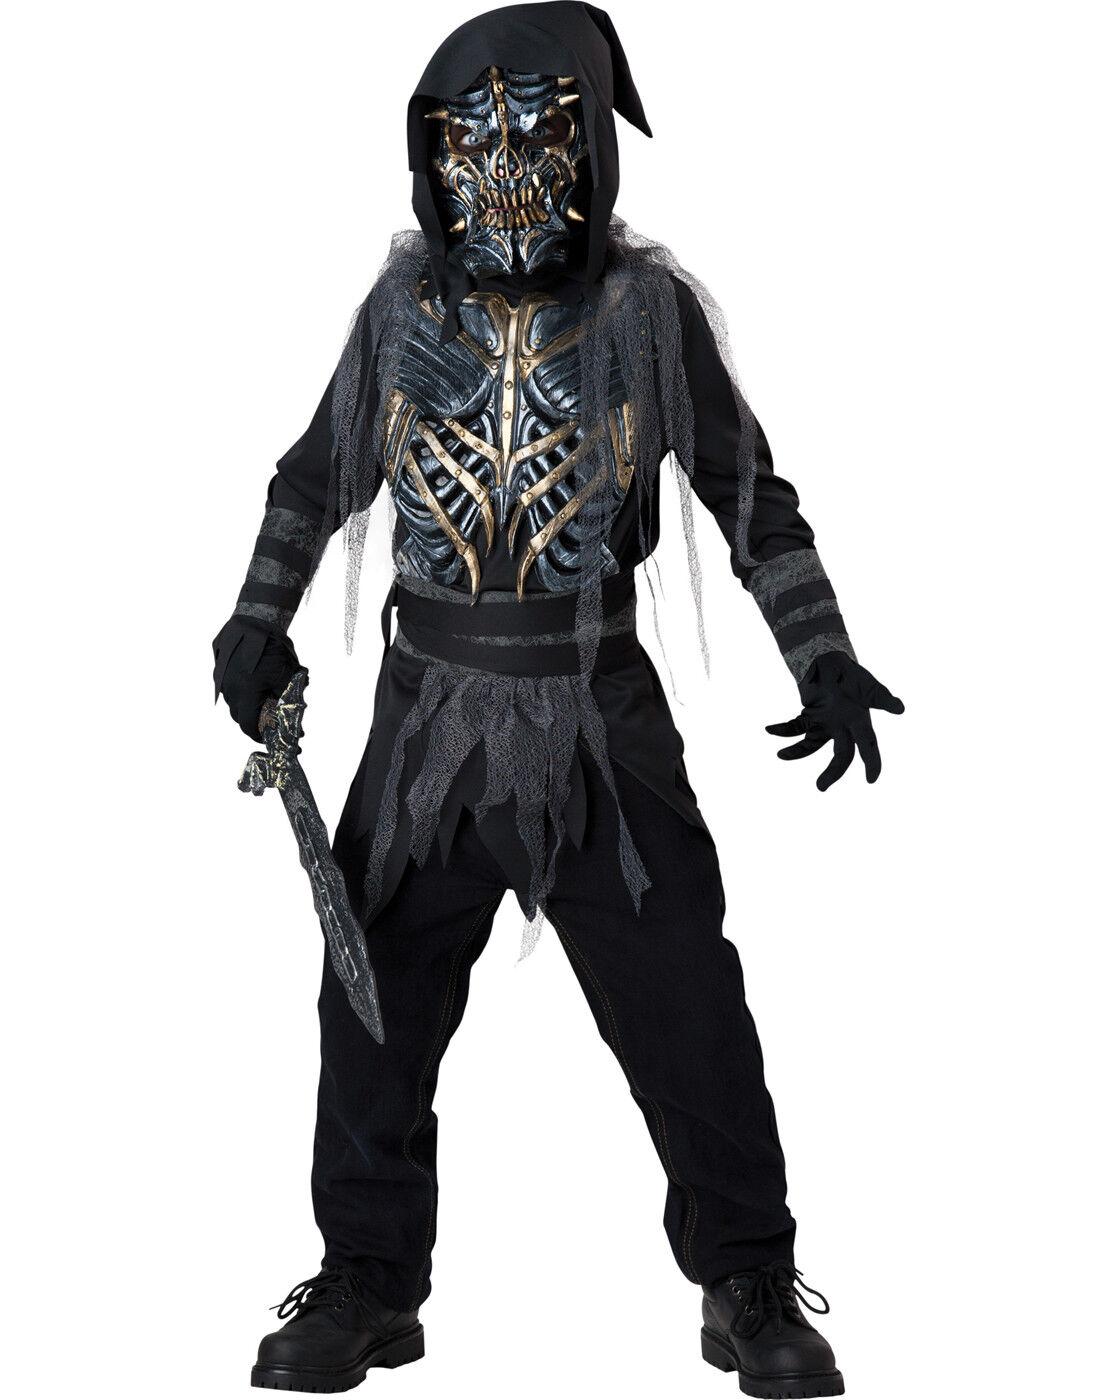 Grimm Reaper Death Warrior Scary Boys Kids Child Monster Halloween Costume